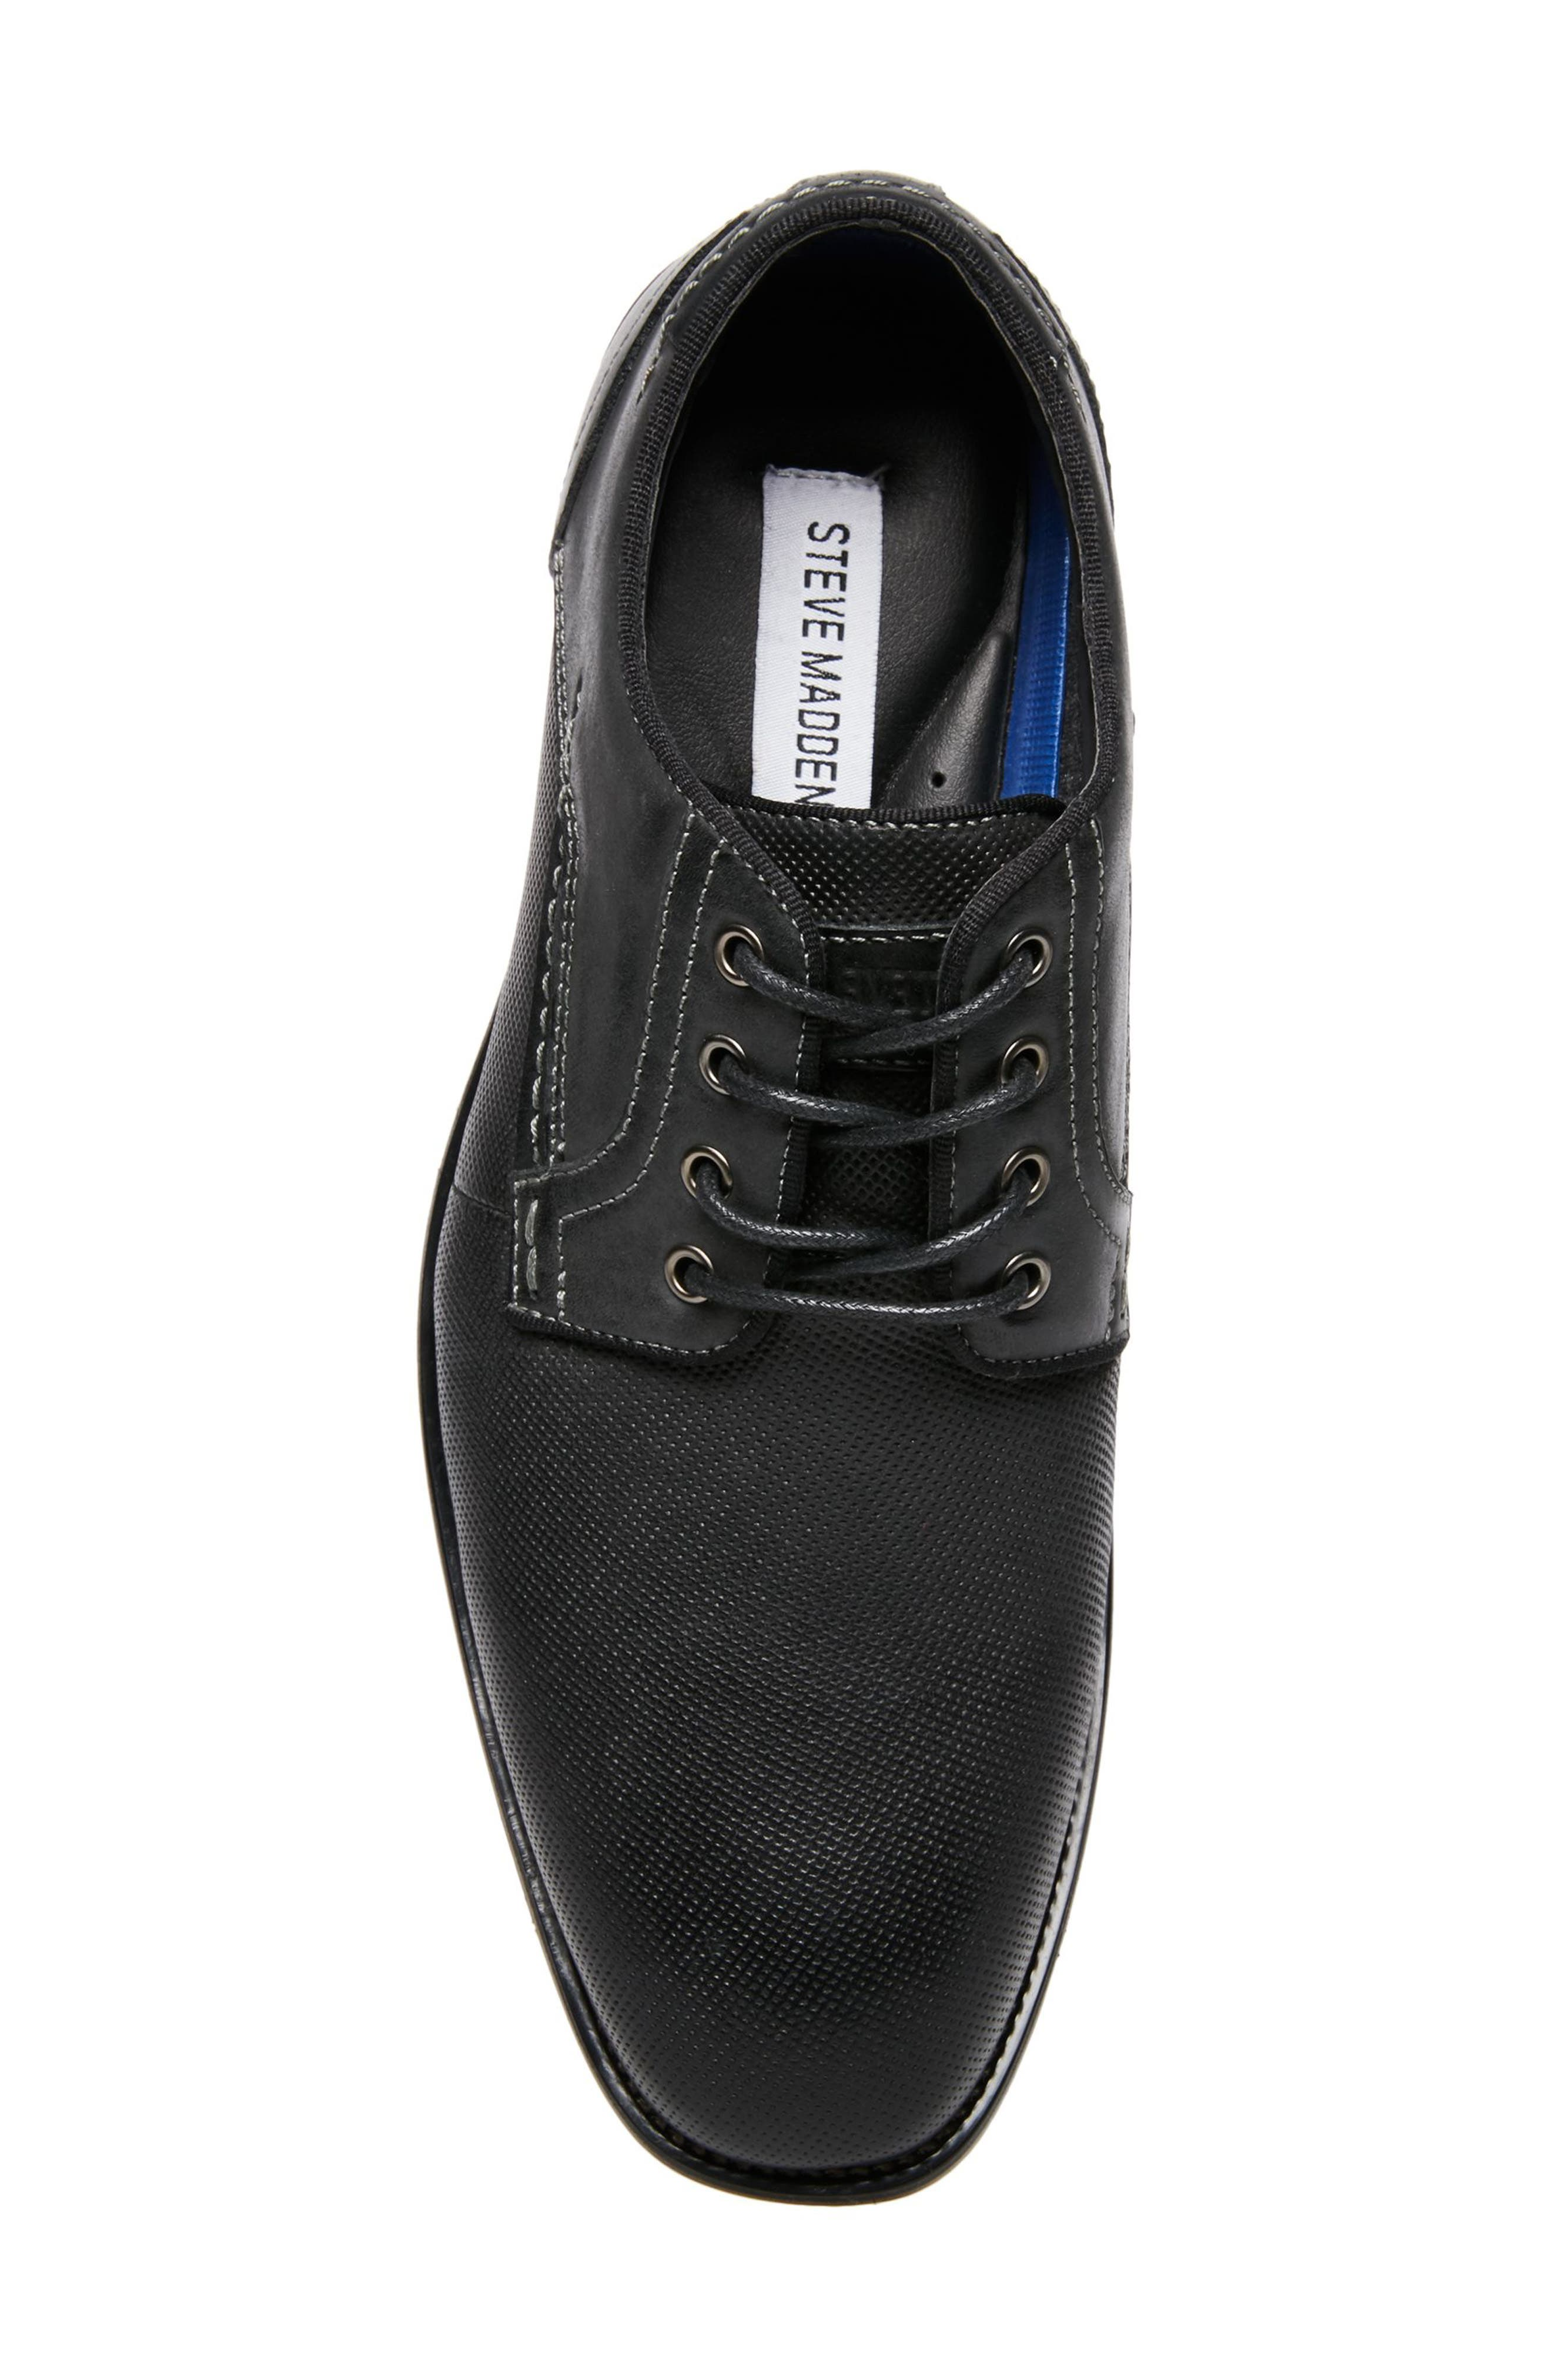 Jaysun Embossed Plain Toe Derby,                             Alternate thumbnail 5, color,                             Dark Grey Leather